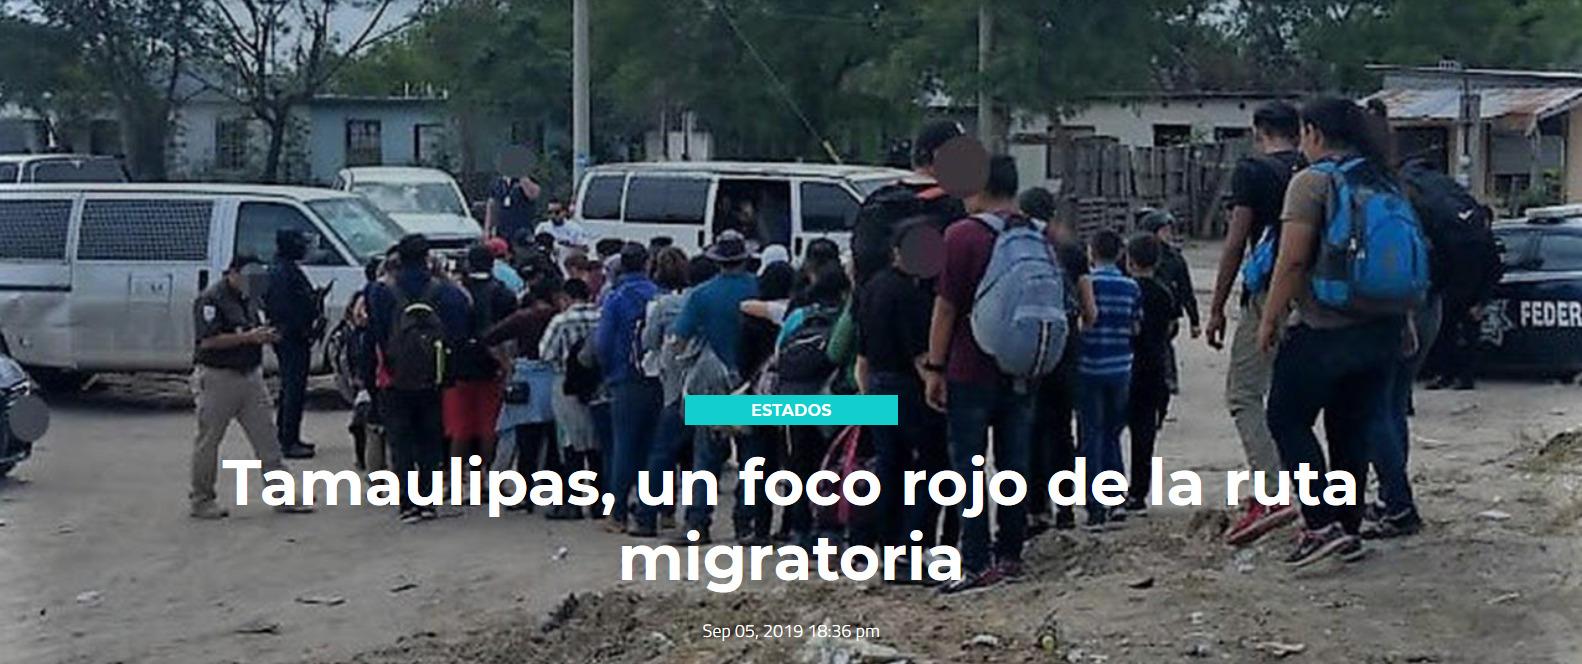 Tamaulipas, un foco rojo de la ruta migratoria